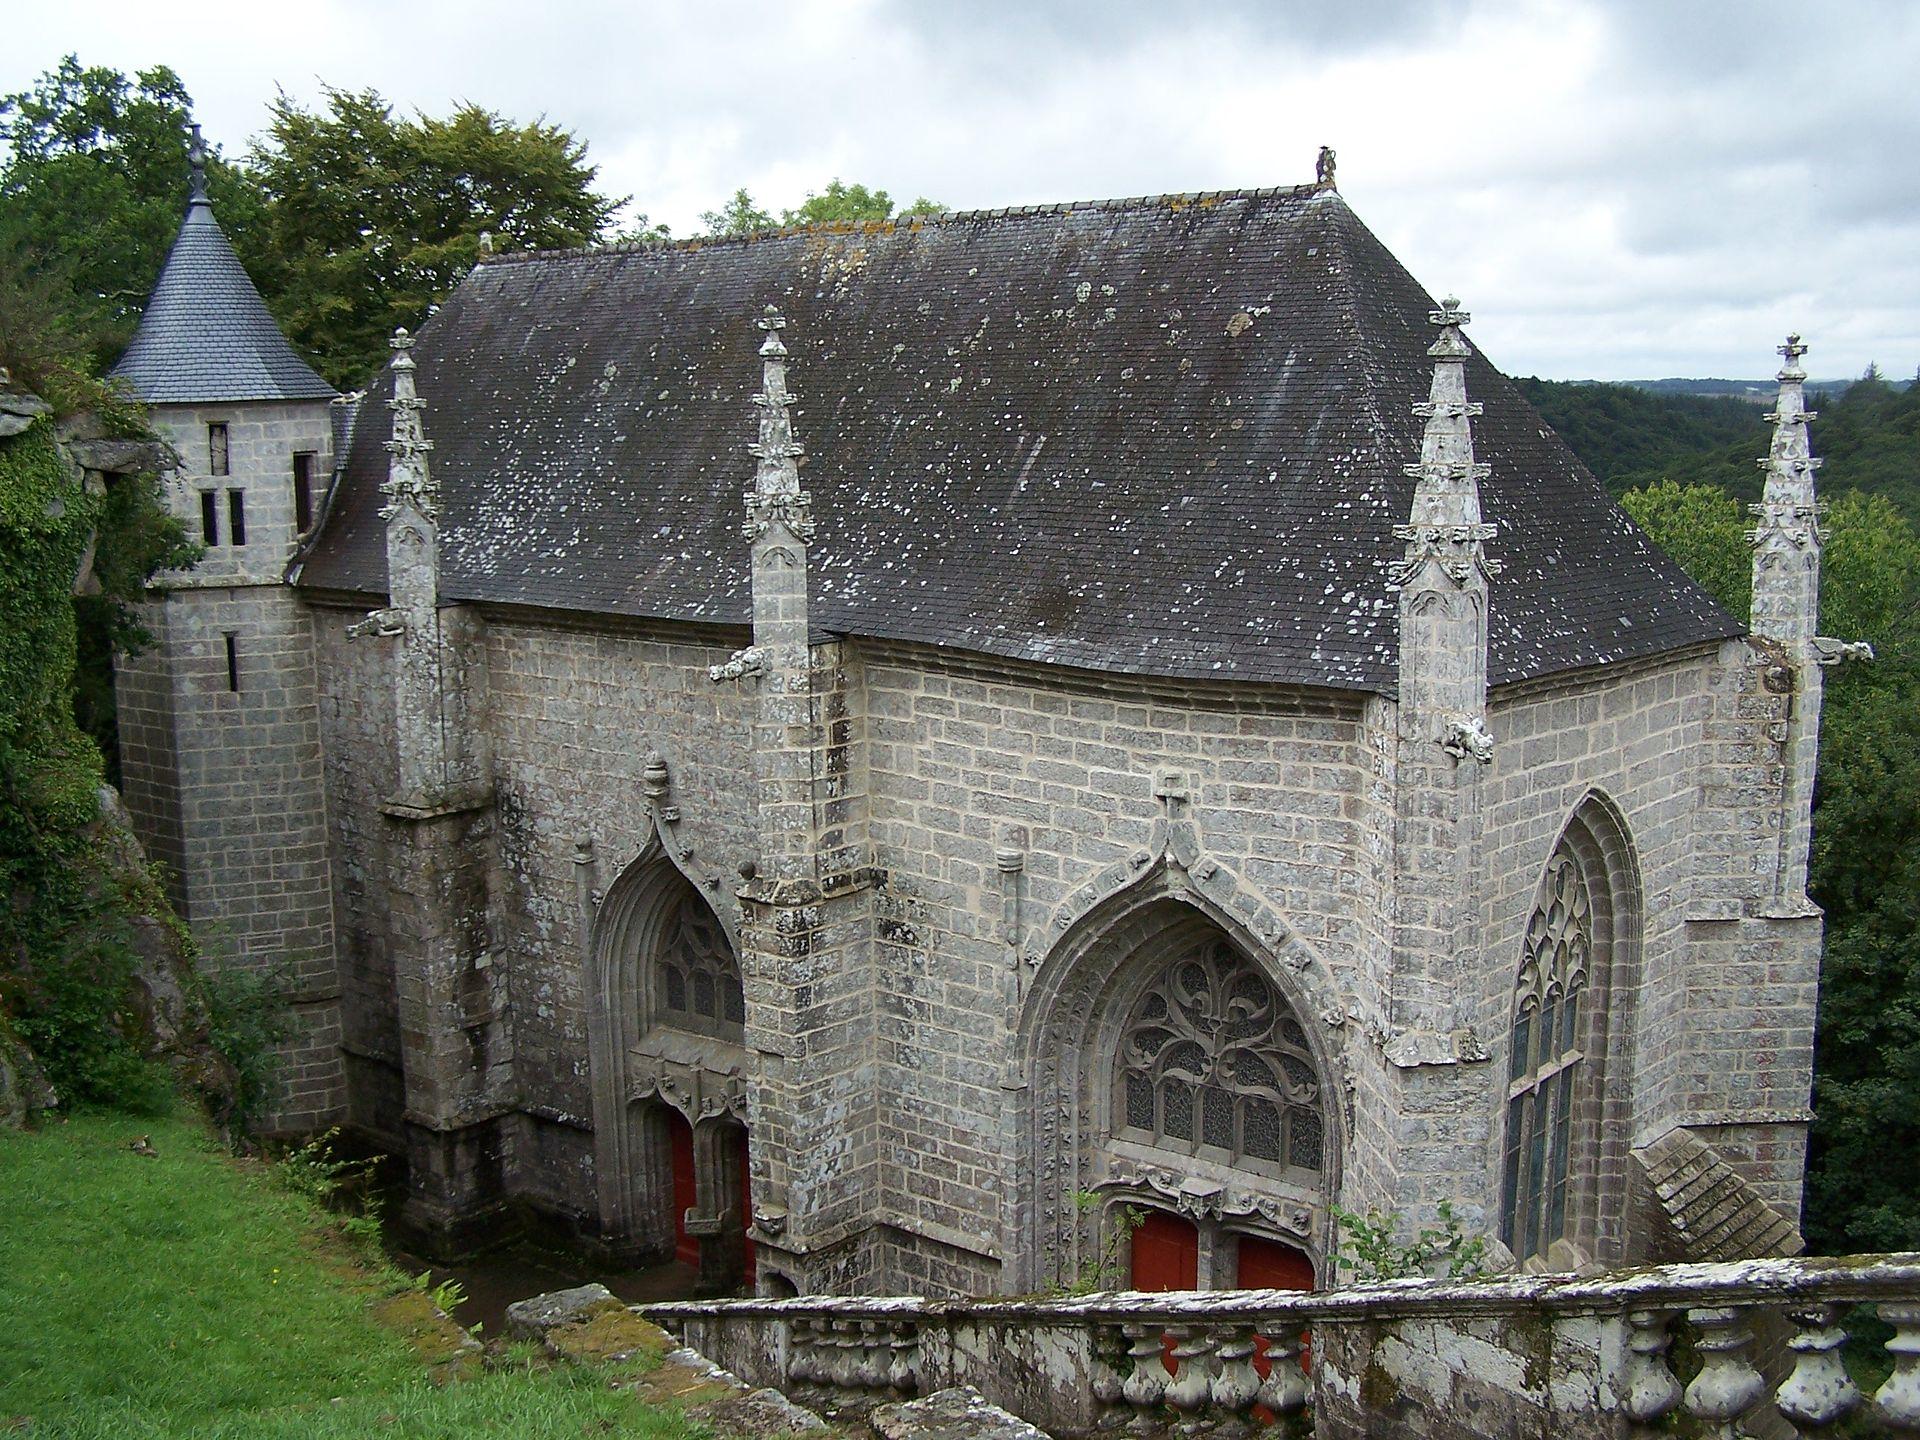 Le Faouët (Morbihan)